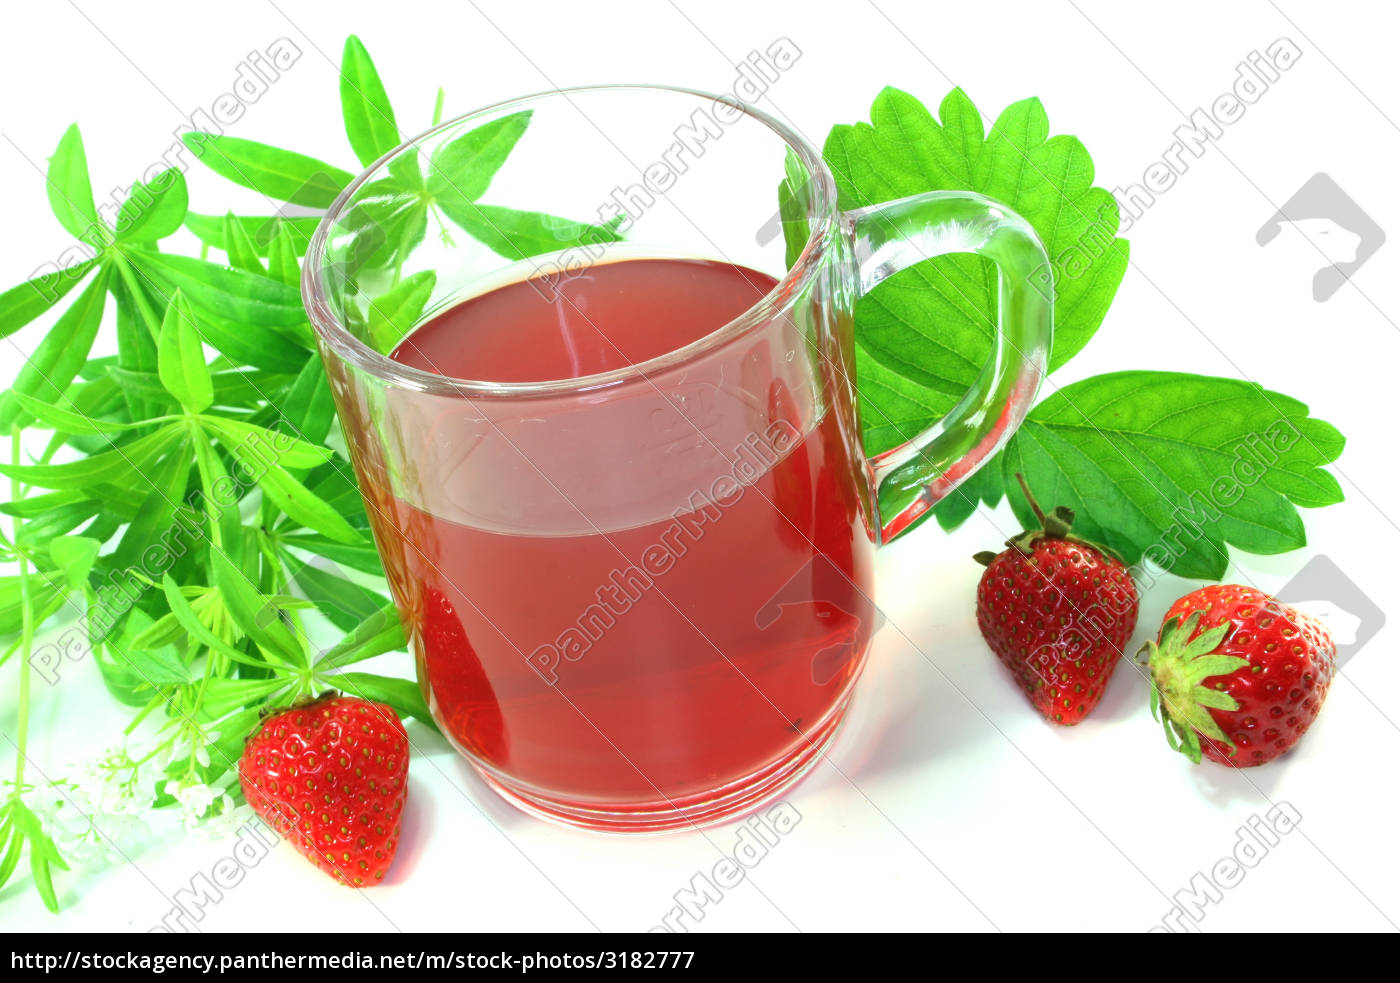 strawberry, woodruff, tea - 3182777